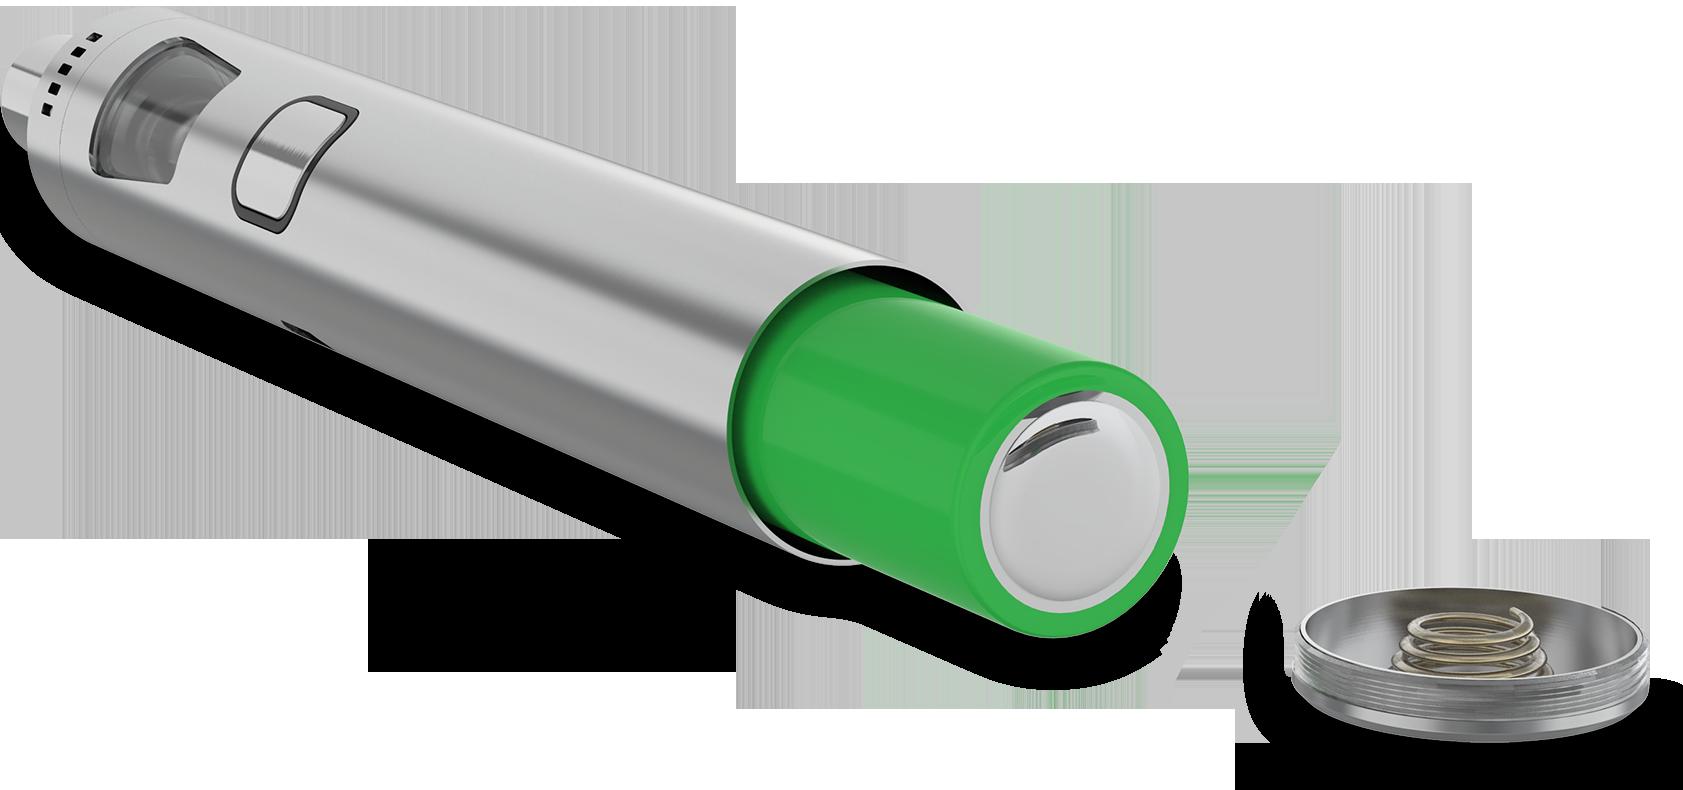 Joyetech eGo AIO Pro C battery